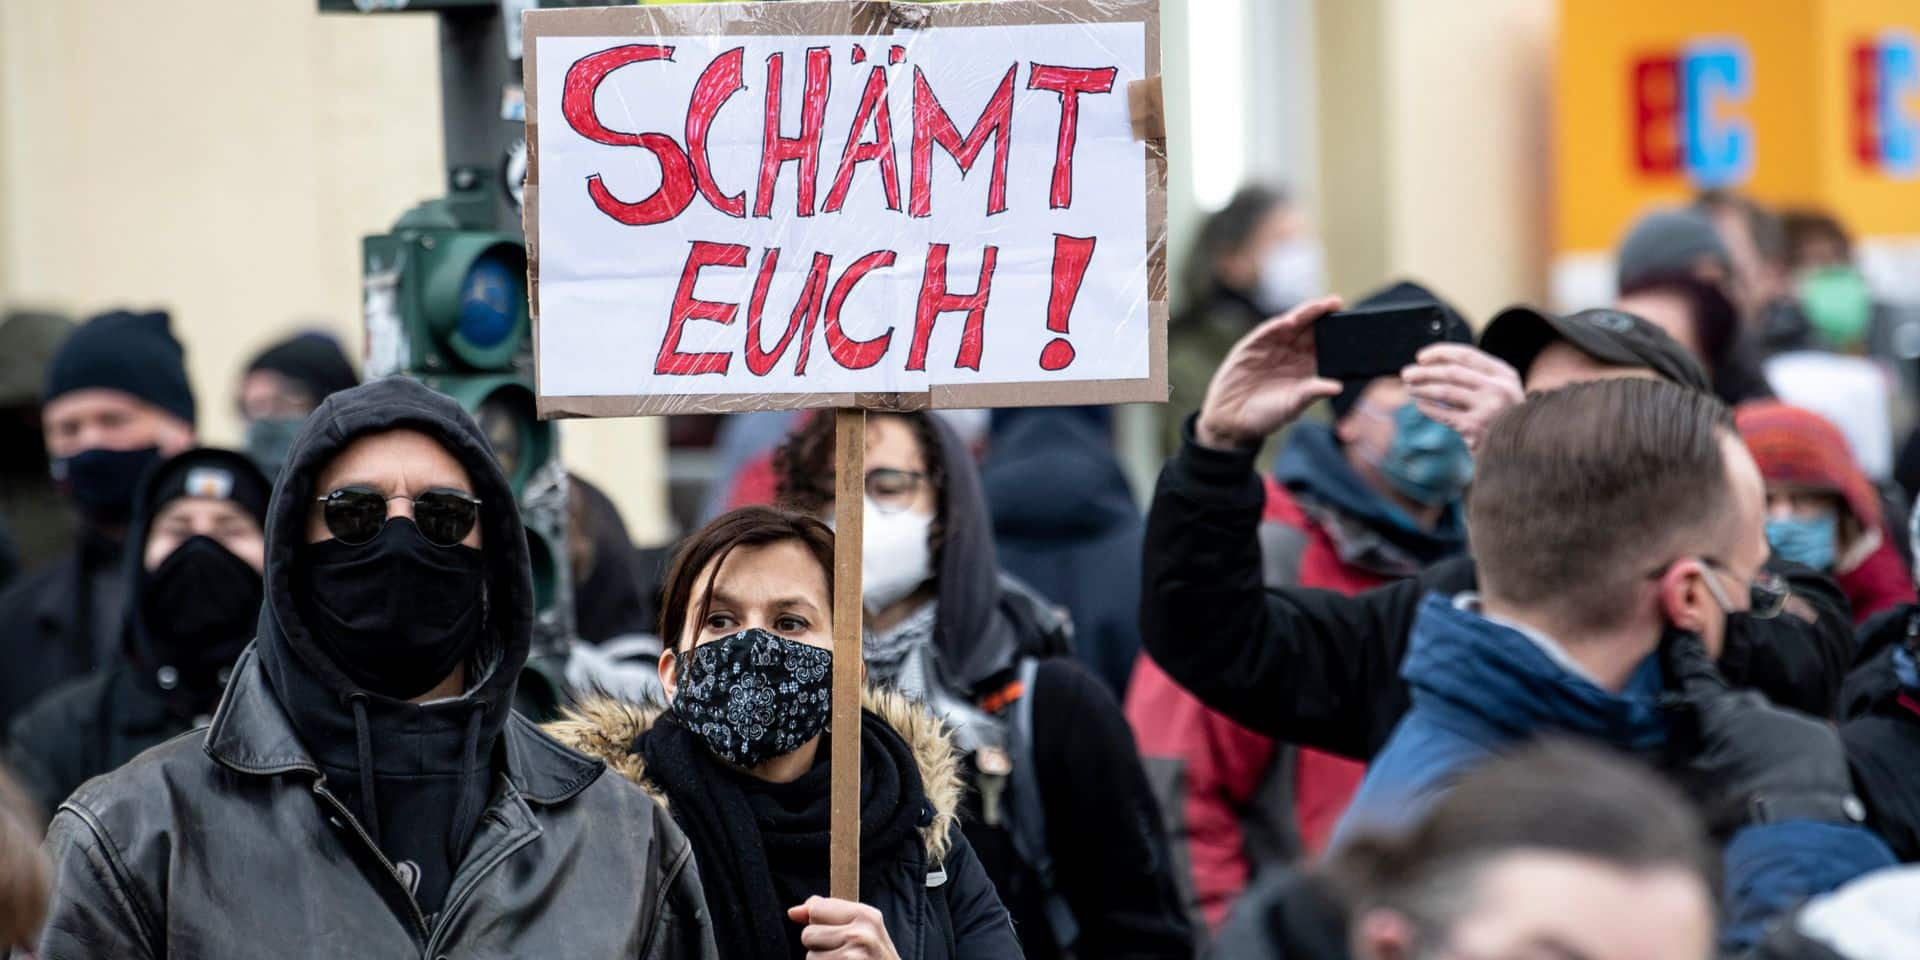 La marche contre les mesures anti-coronavirus à Berlin a mobilisé peu de monde